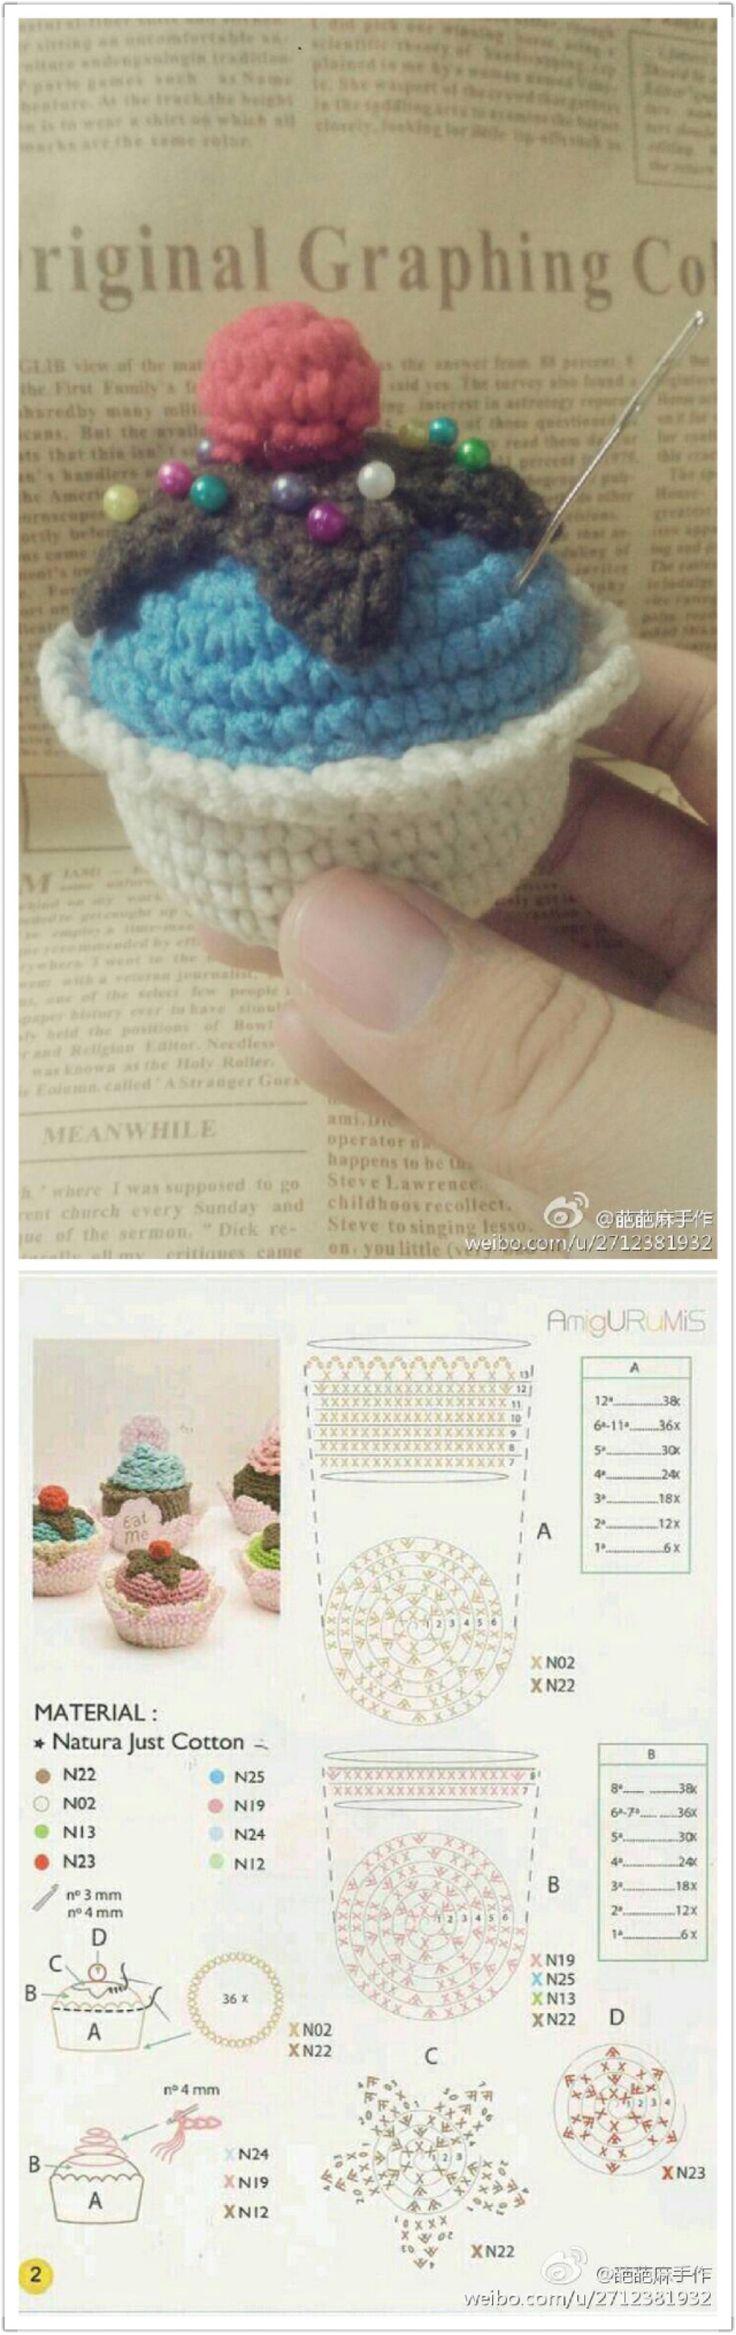 Crochet cupcake chart patter